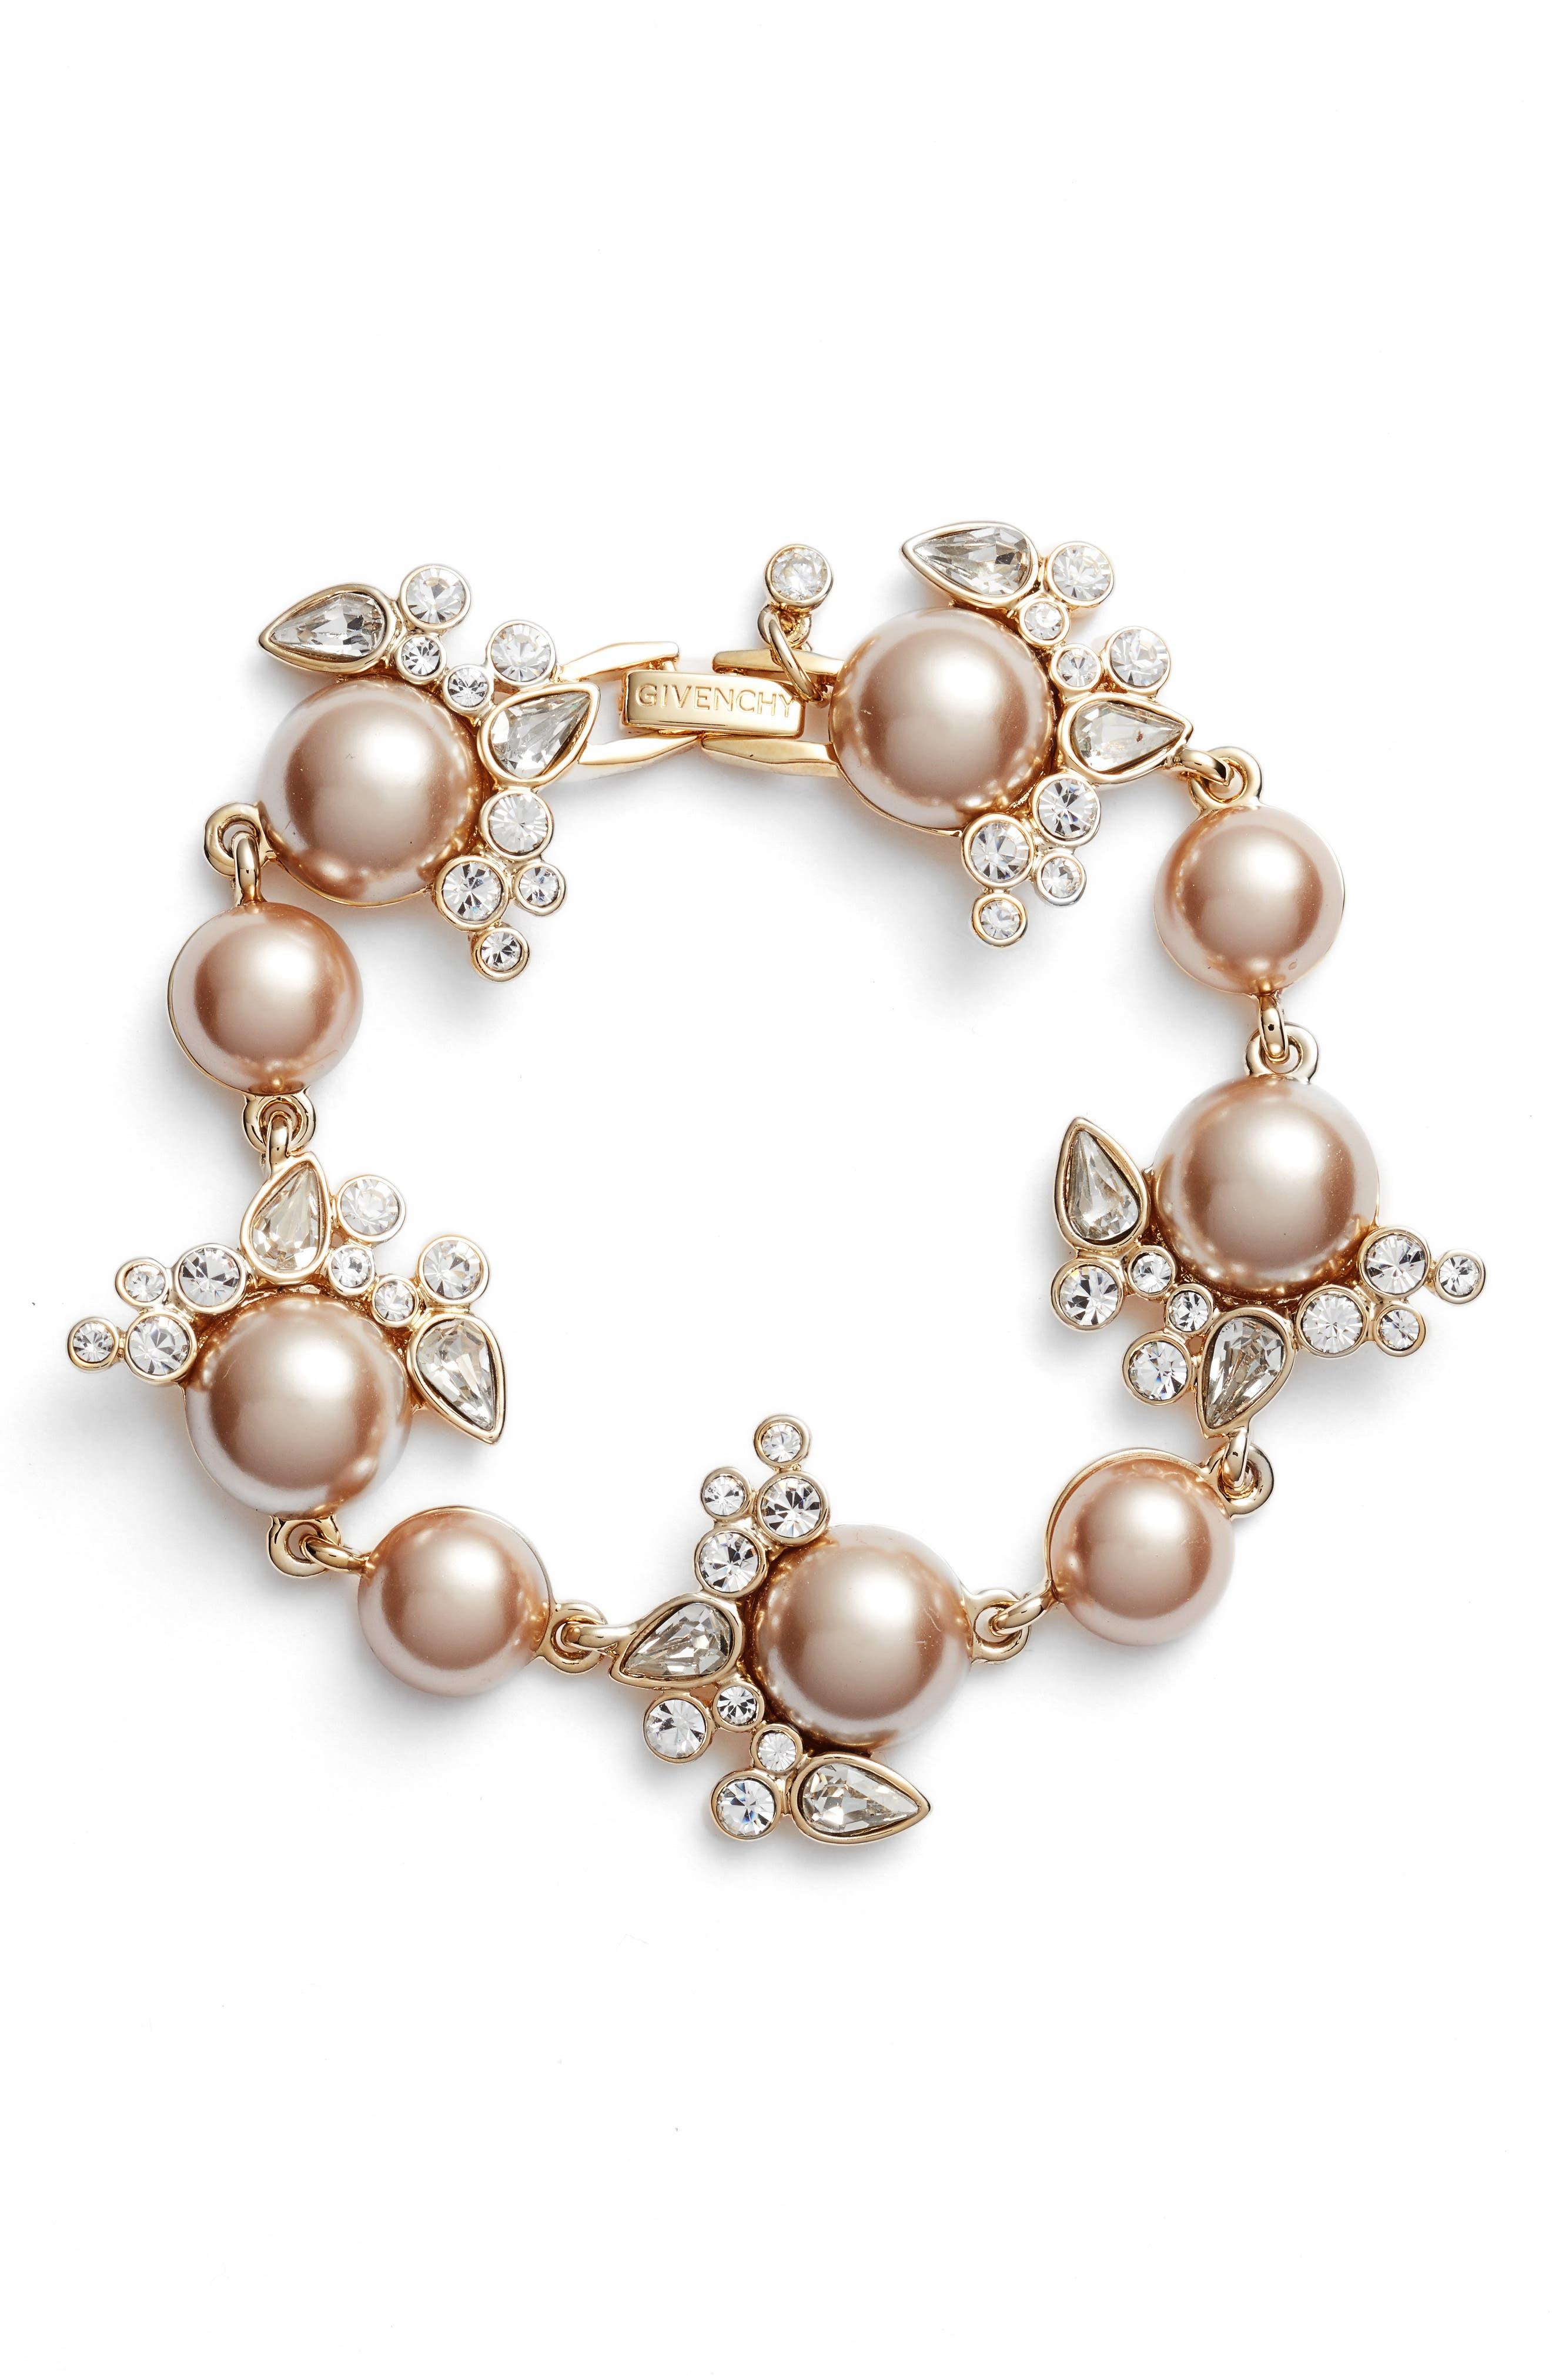 Givenchy Imitation Pearl & Crystal Bracelet